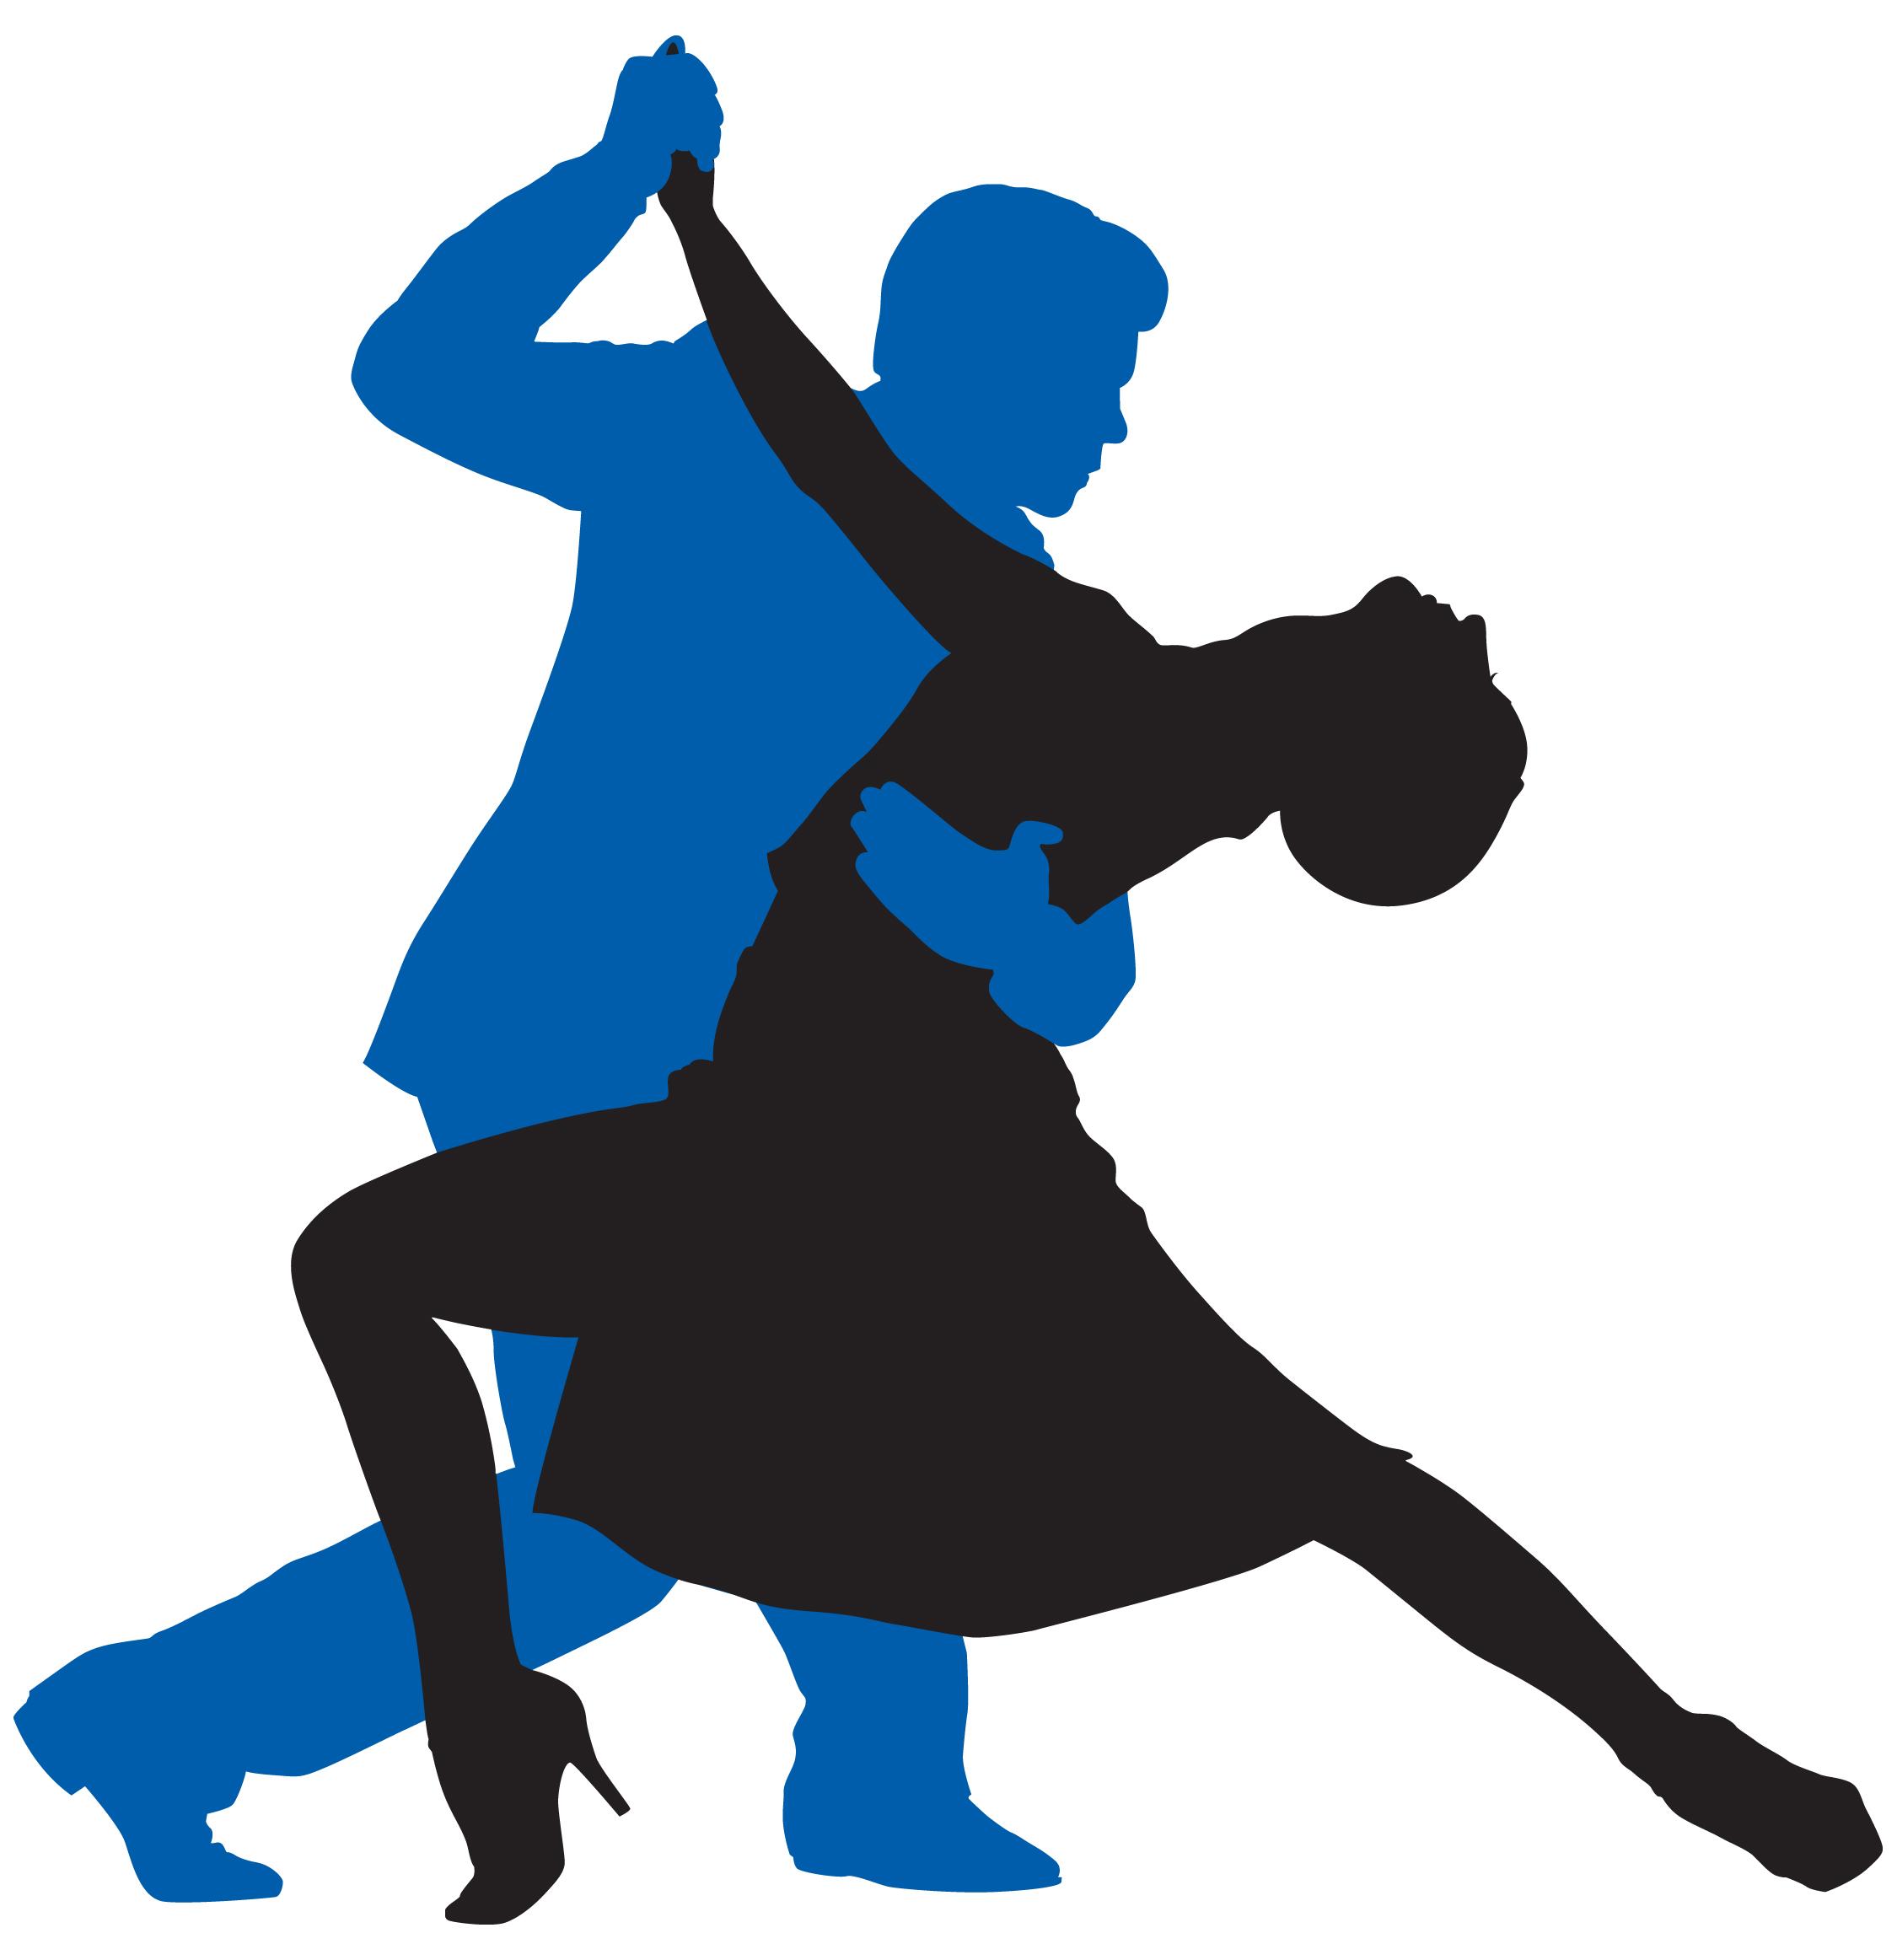 Dancing Silhouette Image